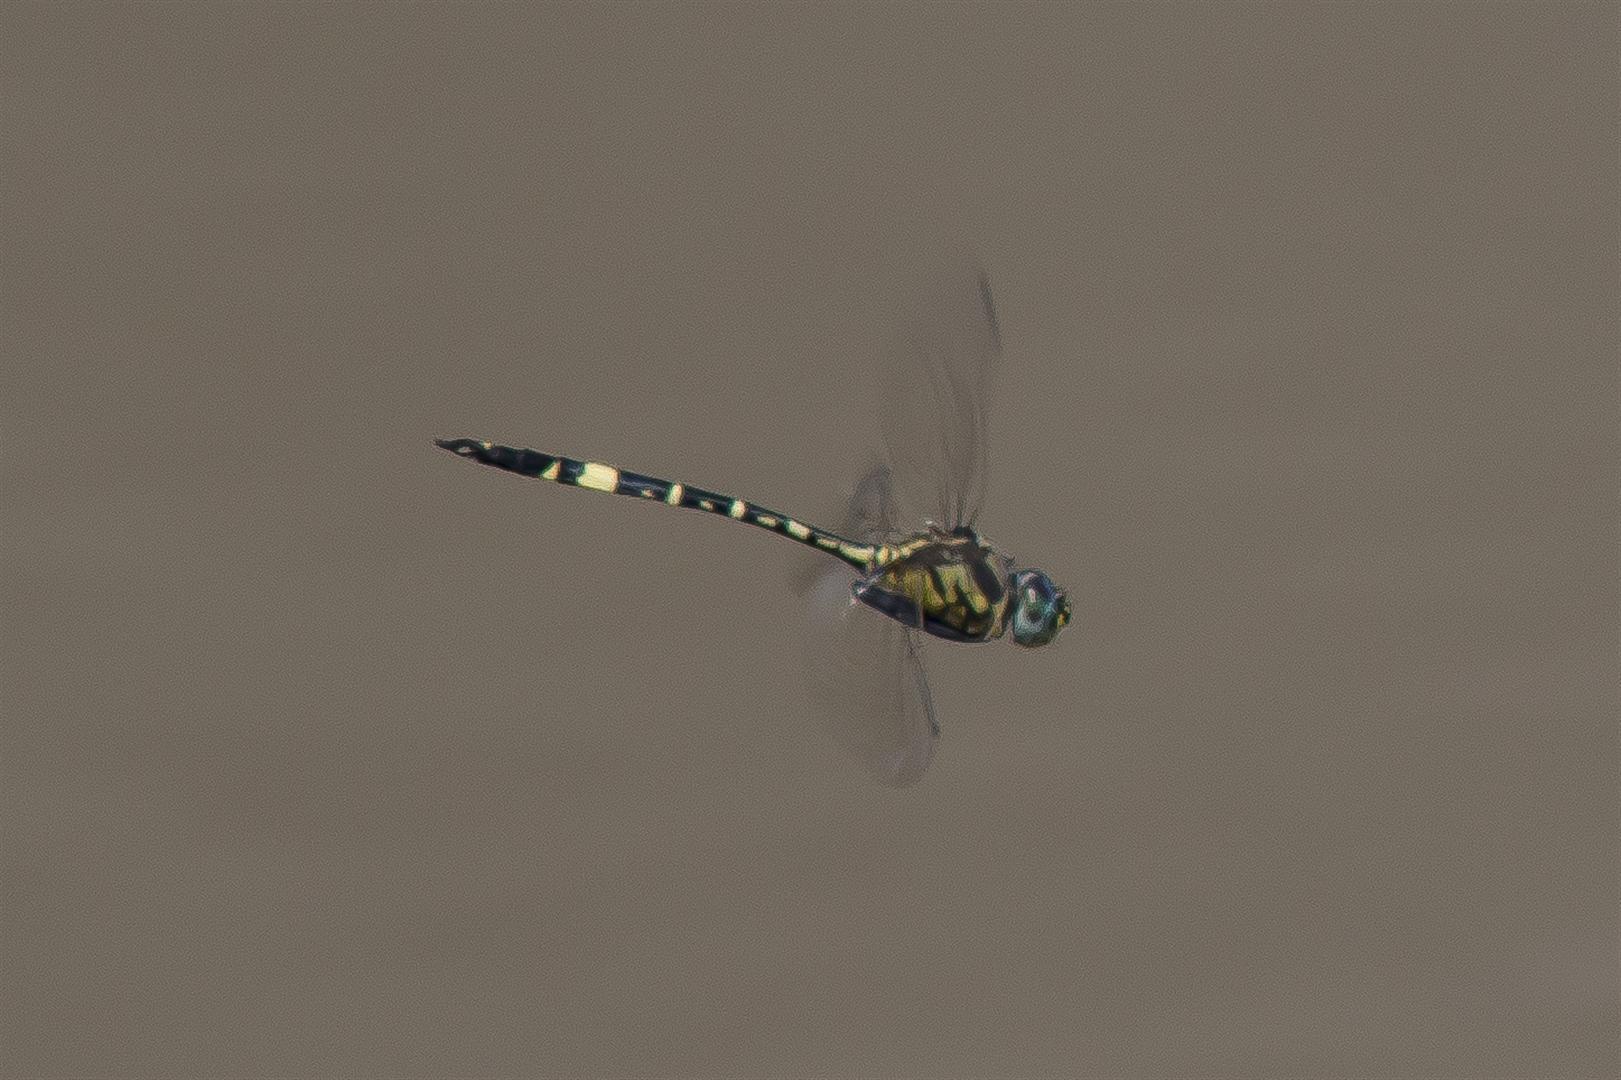 Dragonfly trip with Rod Hosbon, Al Young, Mark Weaver and Harry Ashdown. Murphys Bridge, Lockyer Creek. Hemicordulia superba. Superb Emerald.